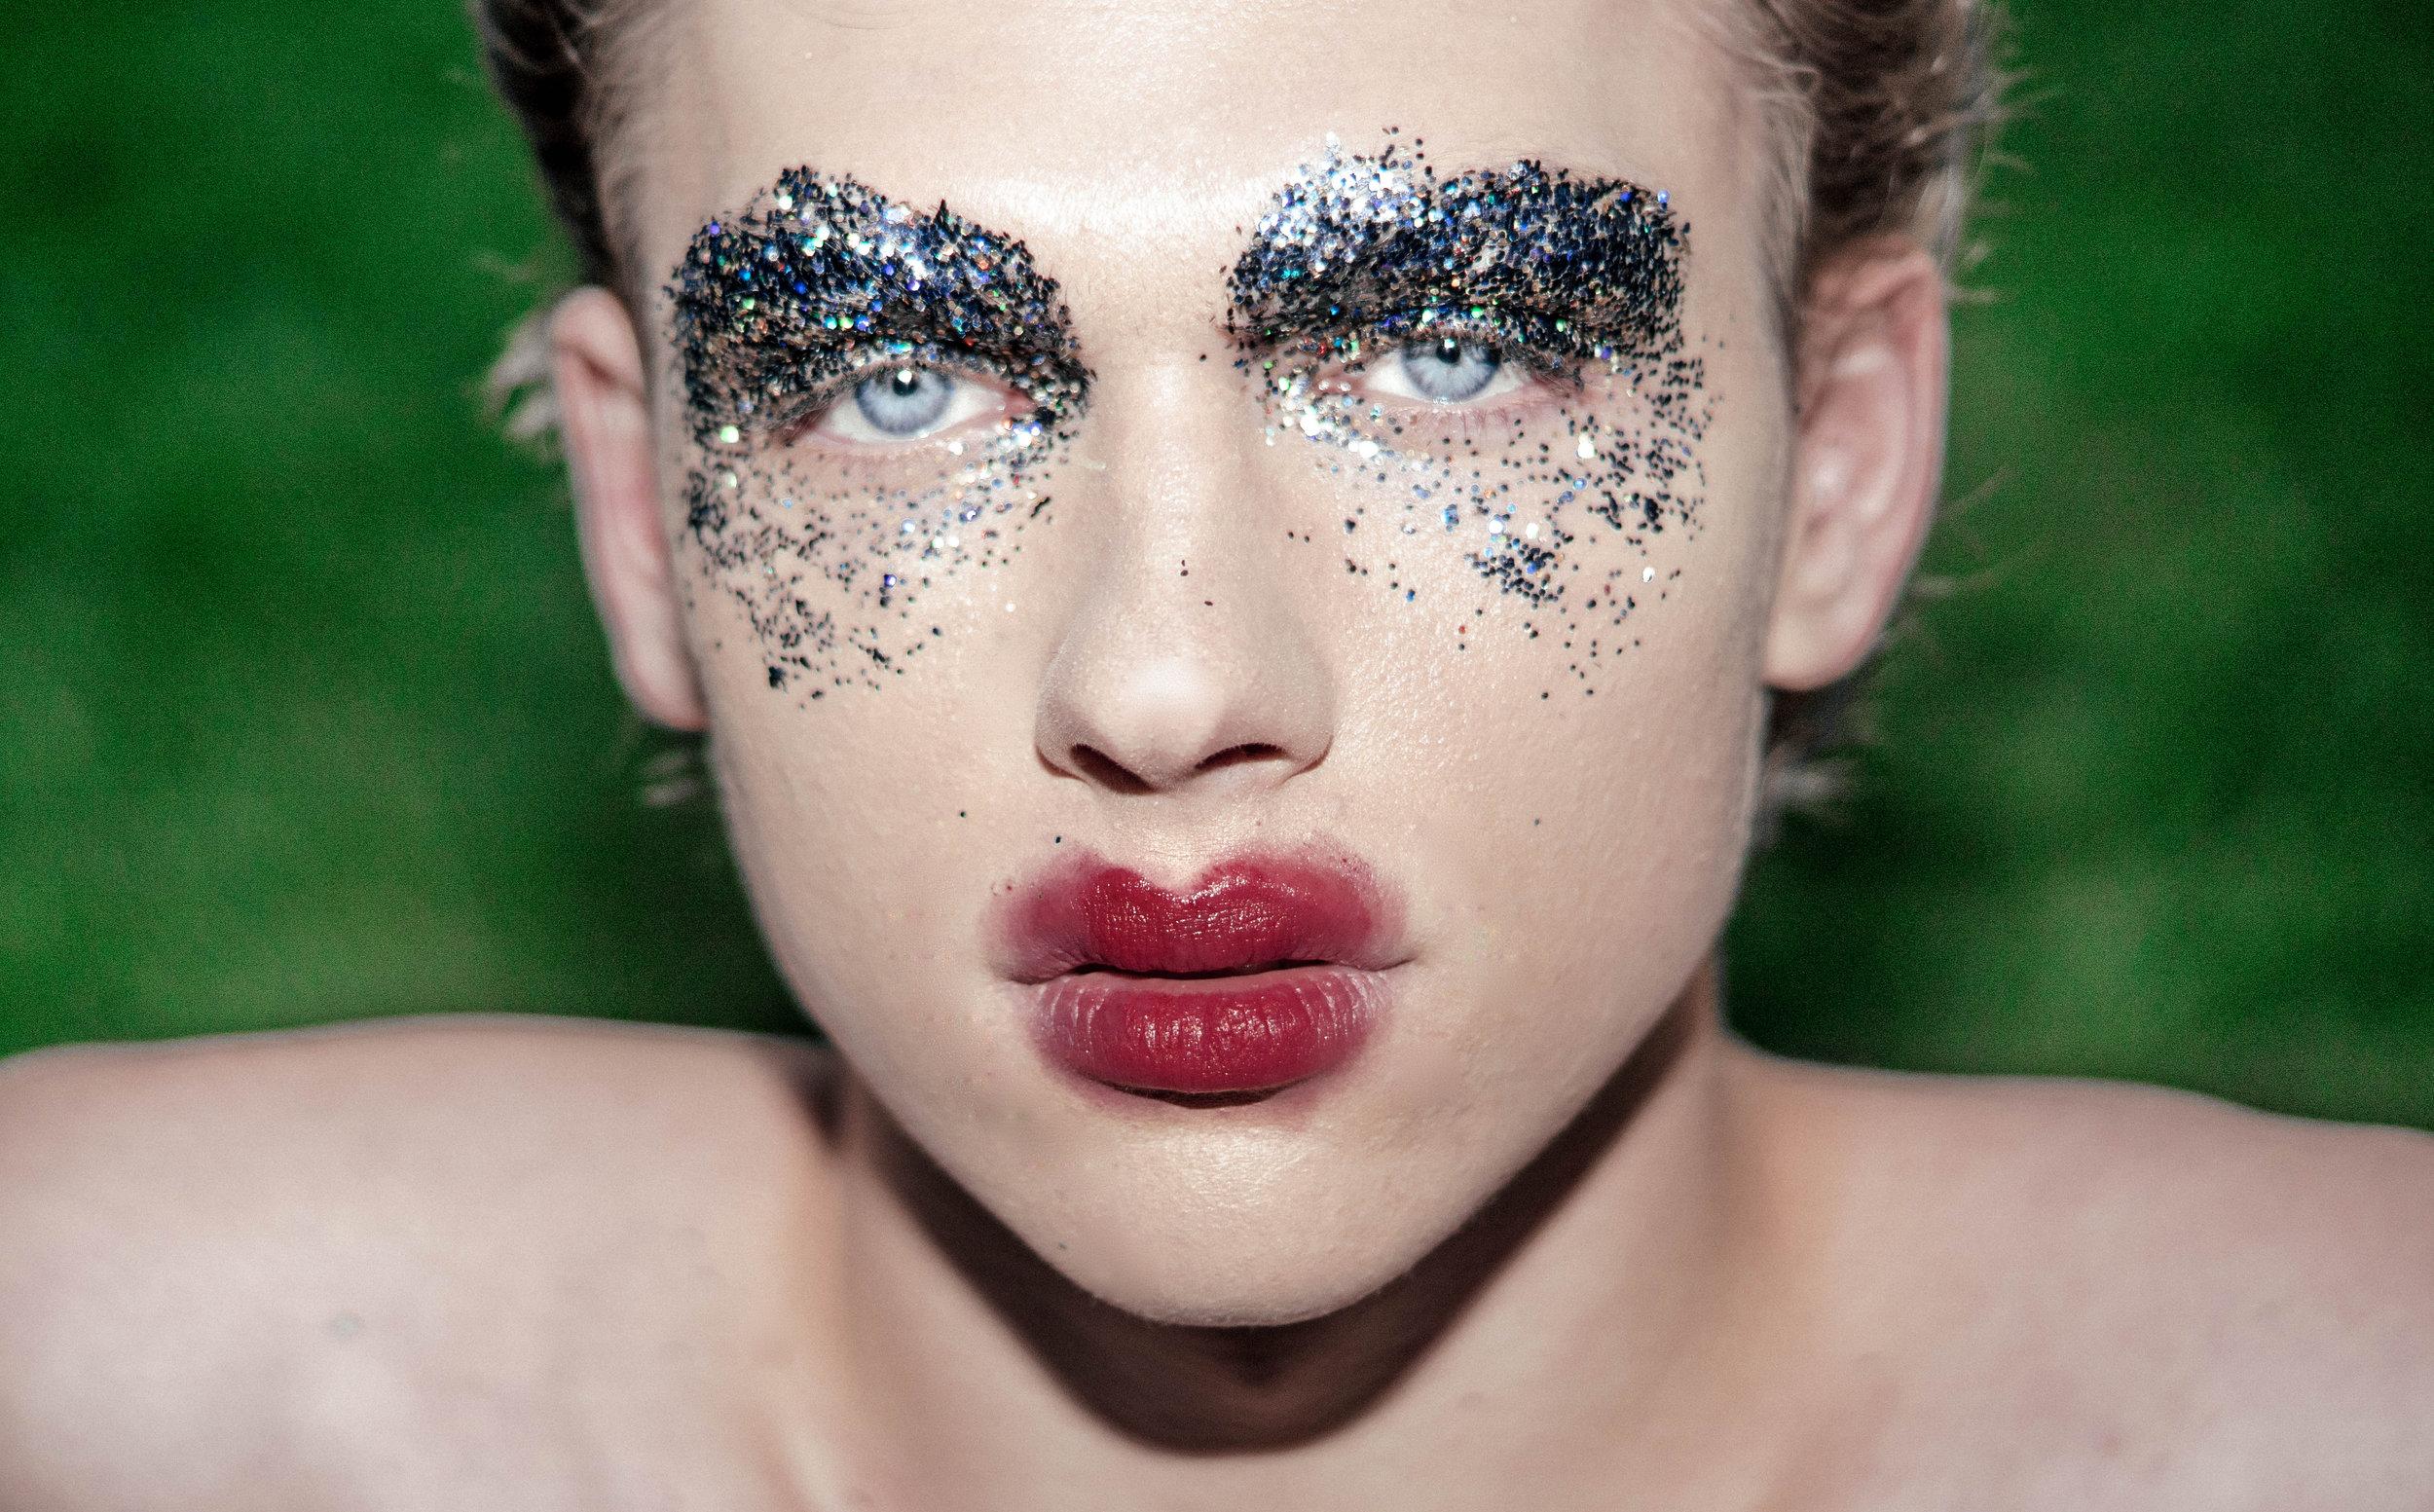 Model: Connor Hollenbach, Wilhelmina models